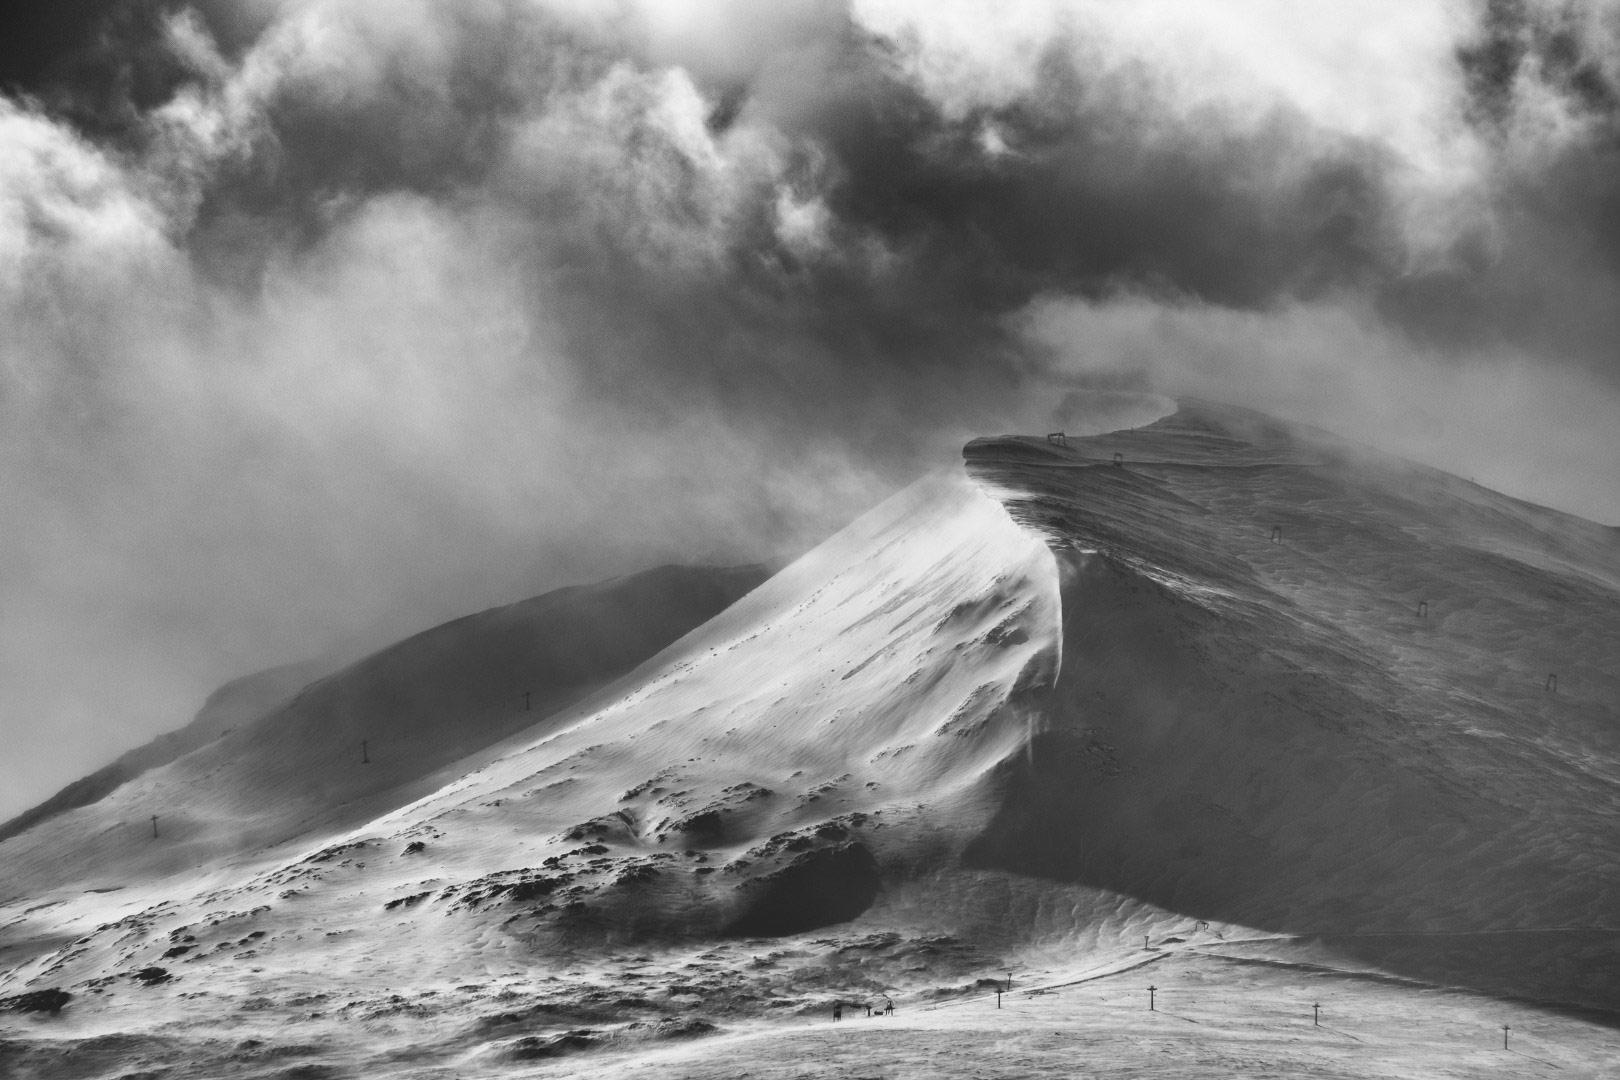 Хребет, © Джейсон Хадсон, Фотоконкурс «Погодный фотограф года» — Weather Photographer of the Year